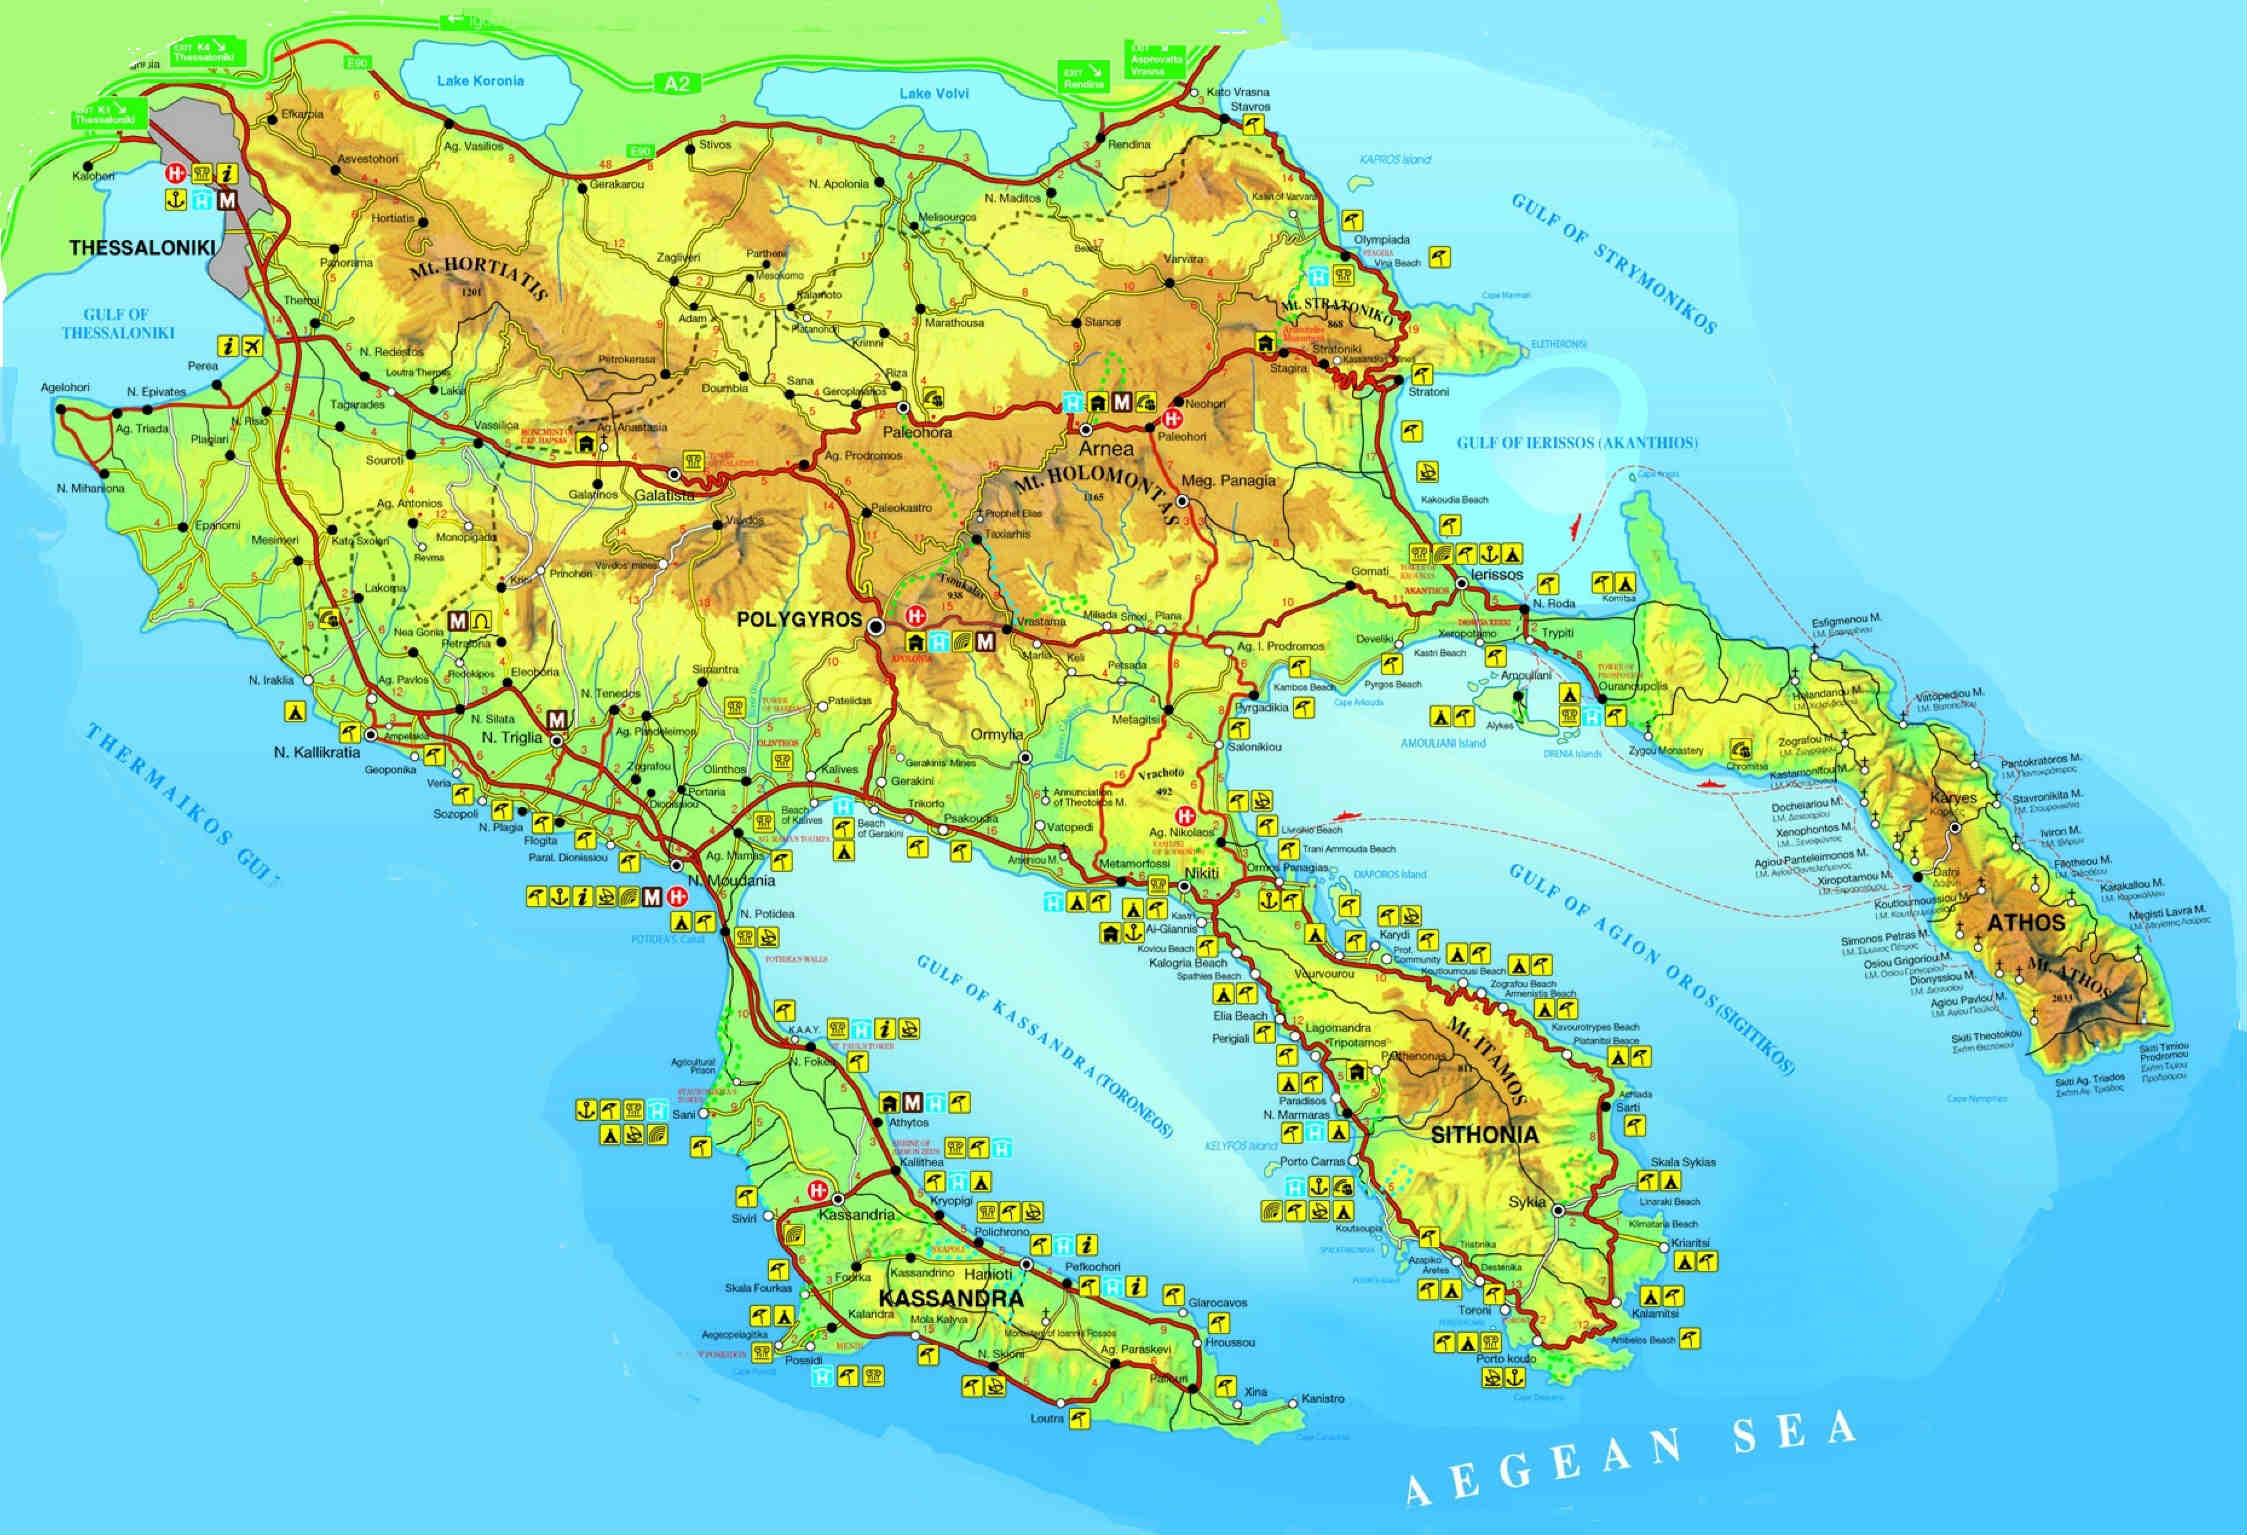 греция, халкидики, кассандра, схема-карта